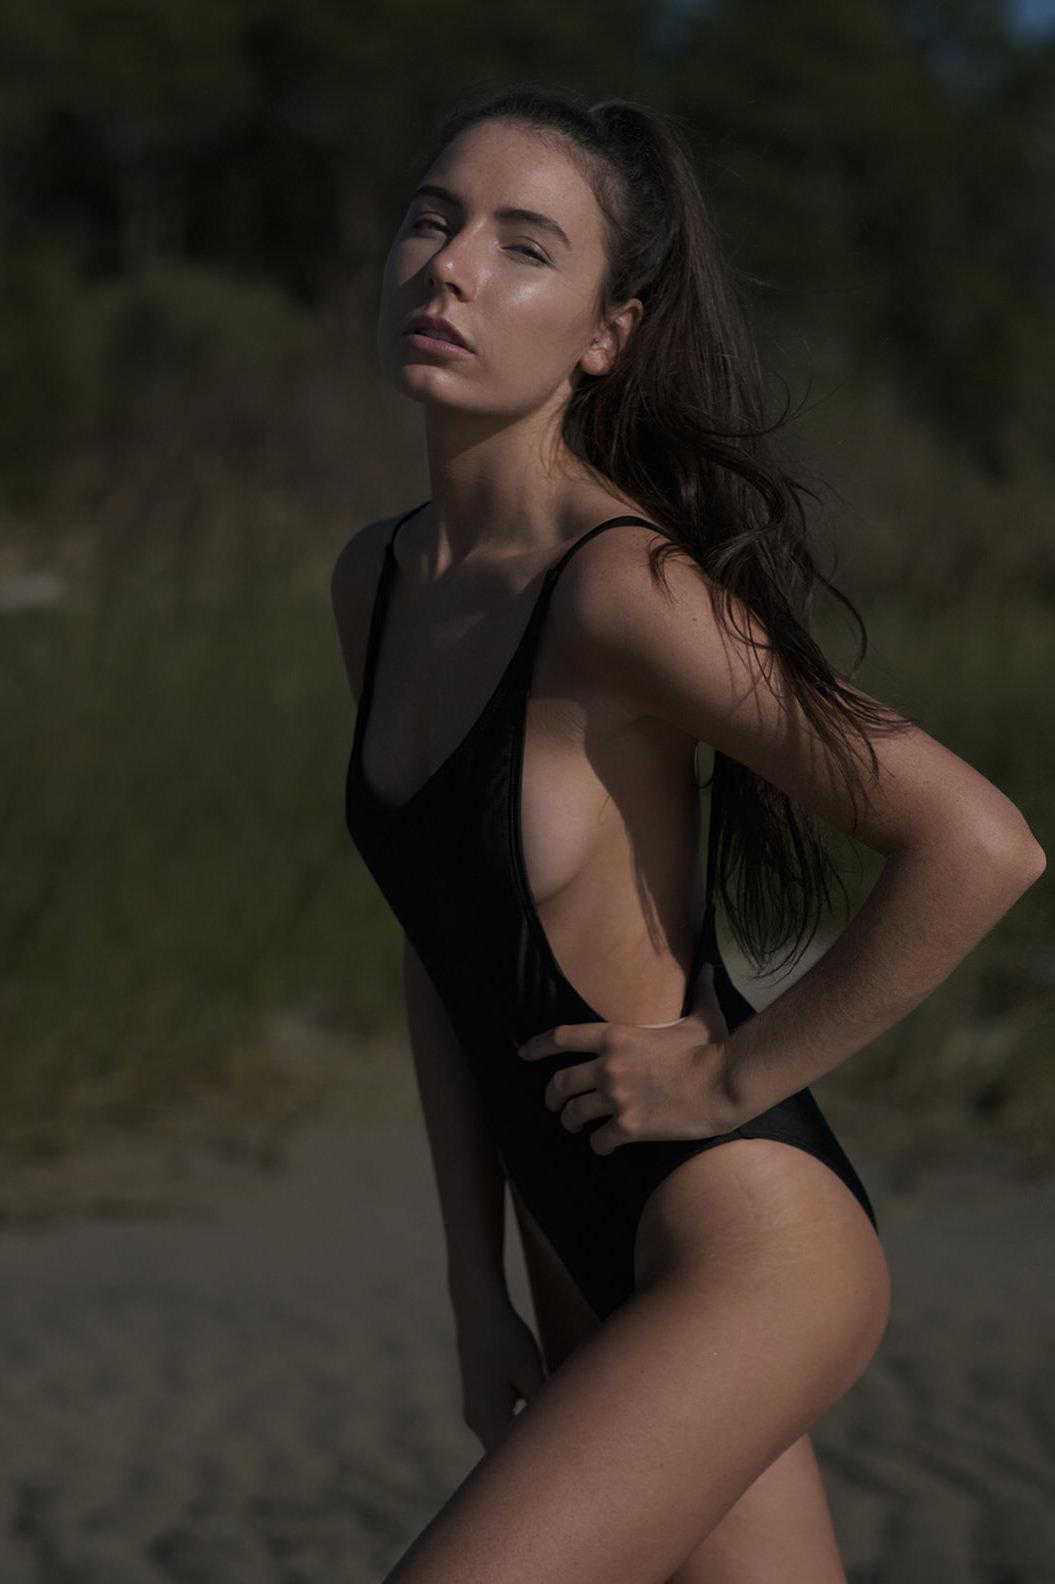 Fuji-X-T3-Sherosphere-Swimwear-Portrait--Carolina-Beach-State-Park-(Before).jpg